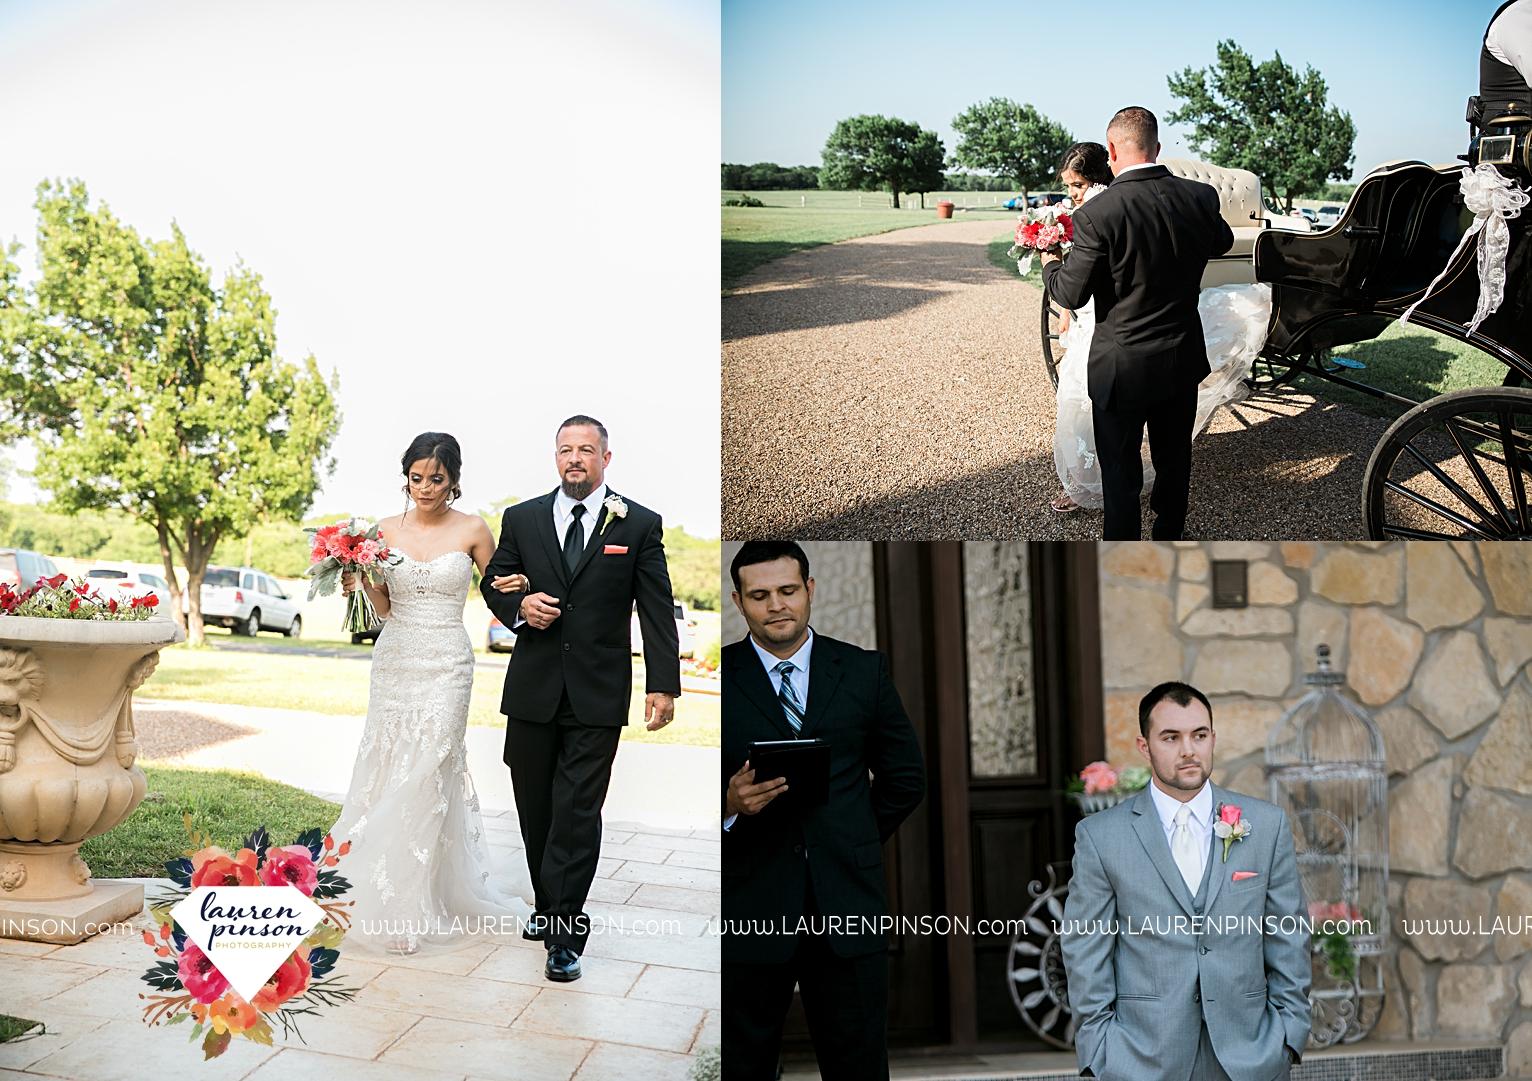 wichita-falls-wedding-nocona-comanche-rose-ranch-rustic-pink-gray-photography-00134.jpg